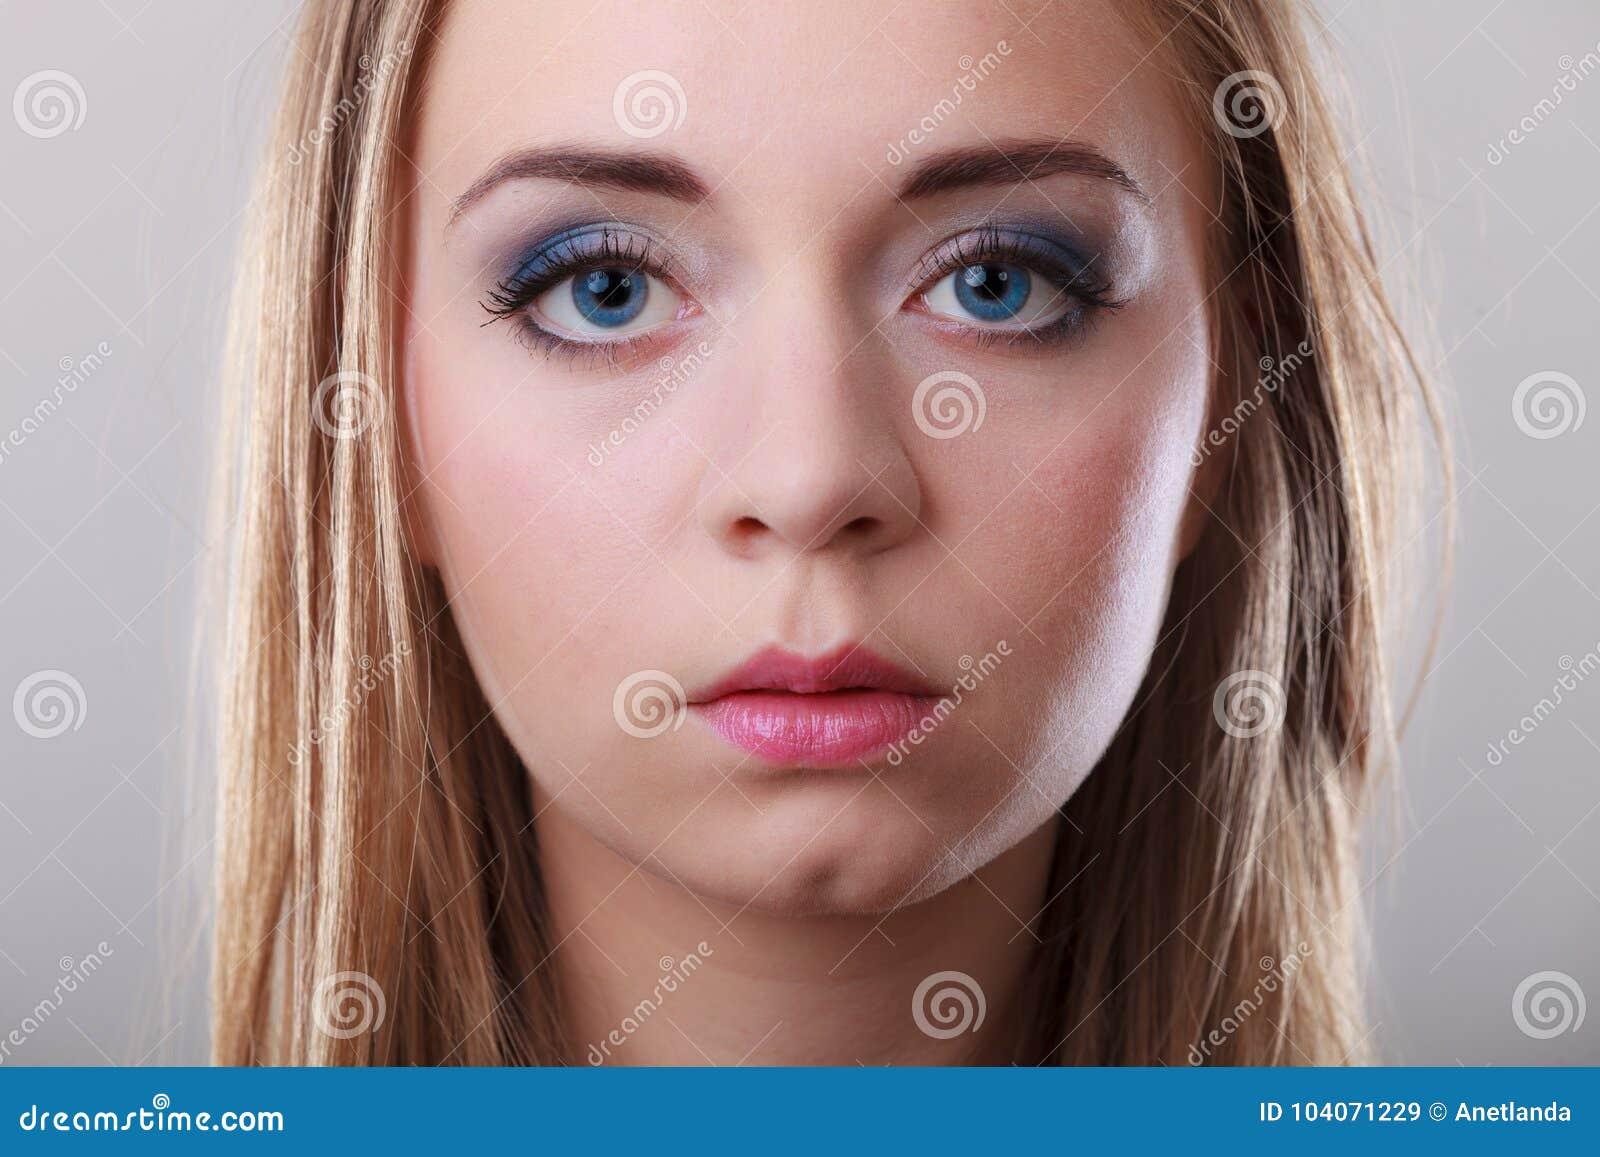 Women Blonde Blue Eyes Long Hair Wavy Hair Portrait: Closeup Portrait Of Blonde Long Hair Girl Stock Image